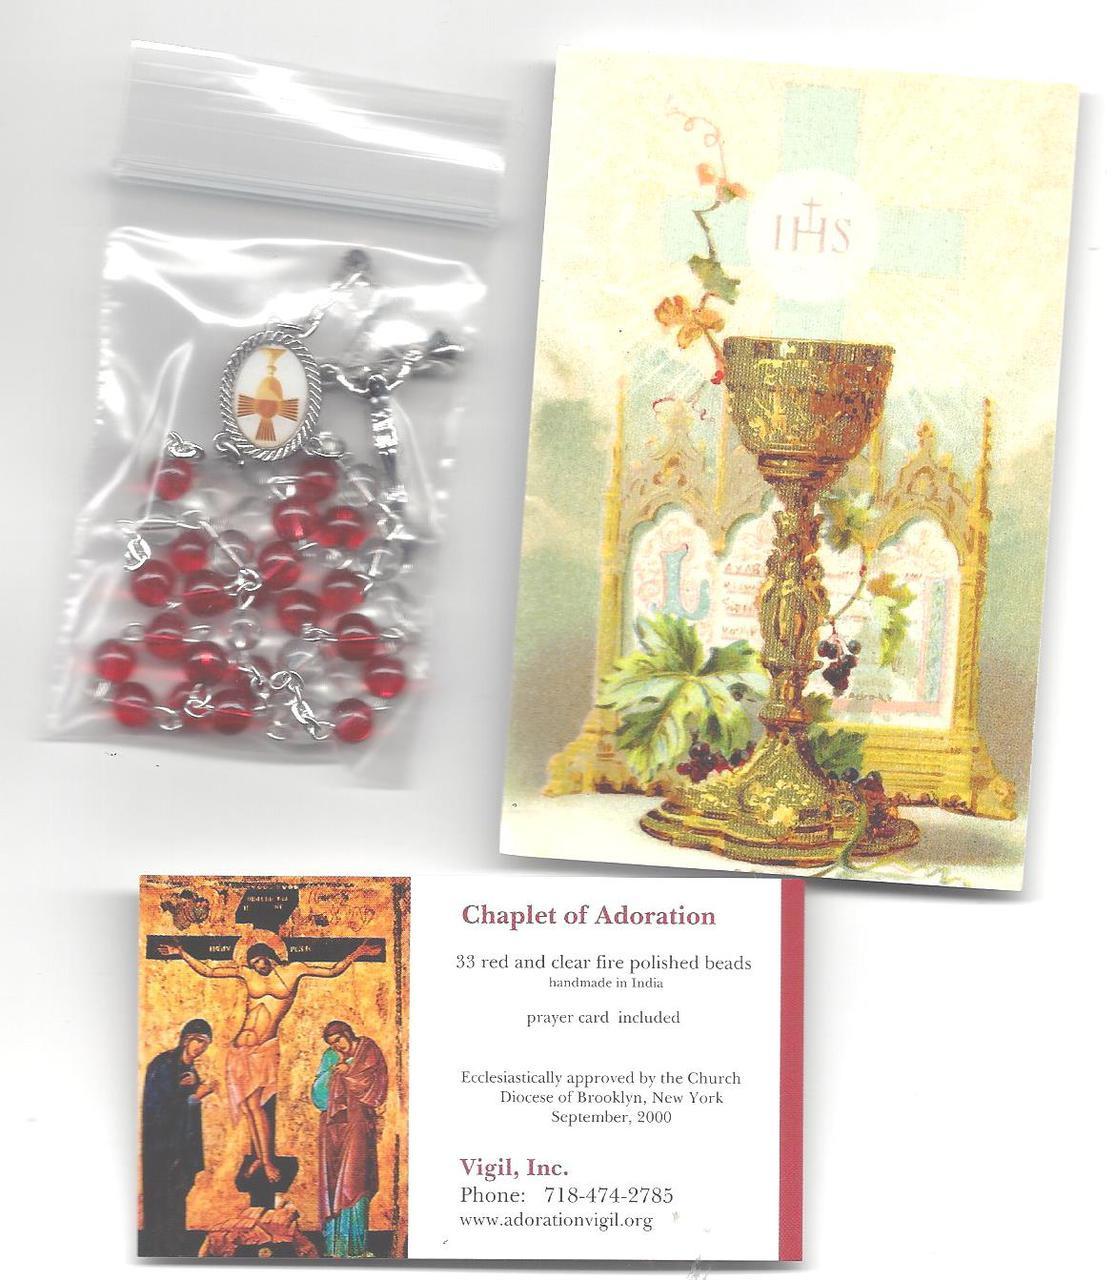 Eucharistic Adoration Chaplet